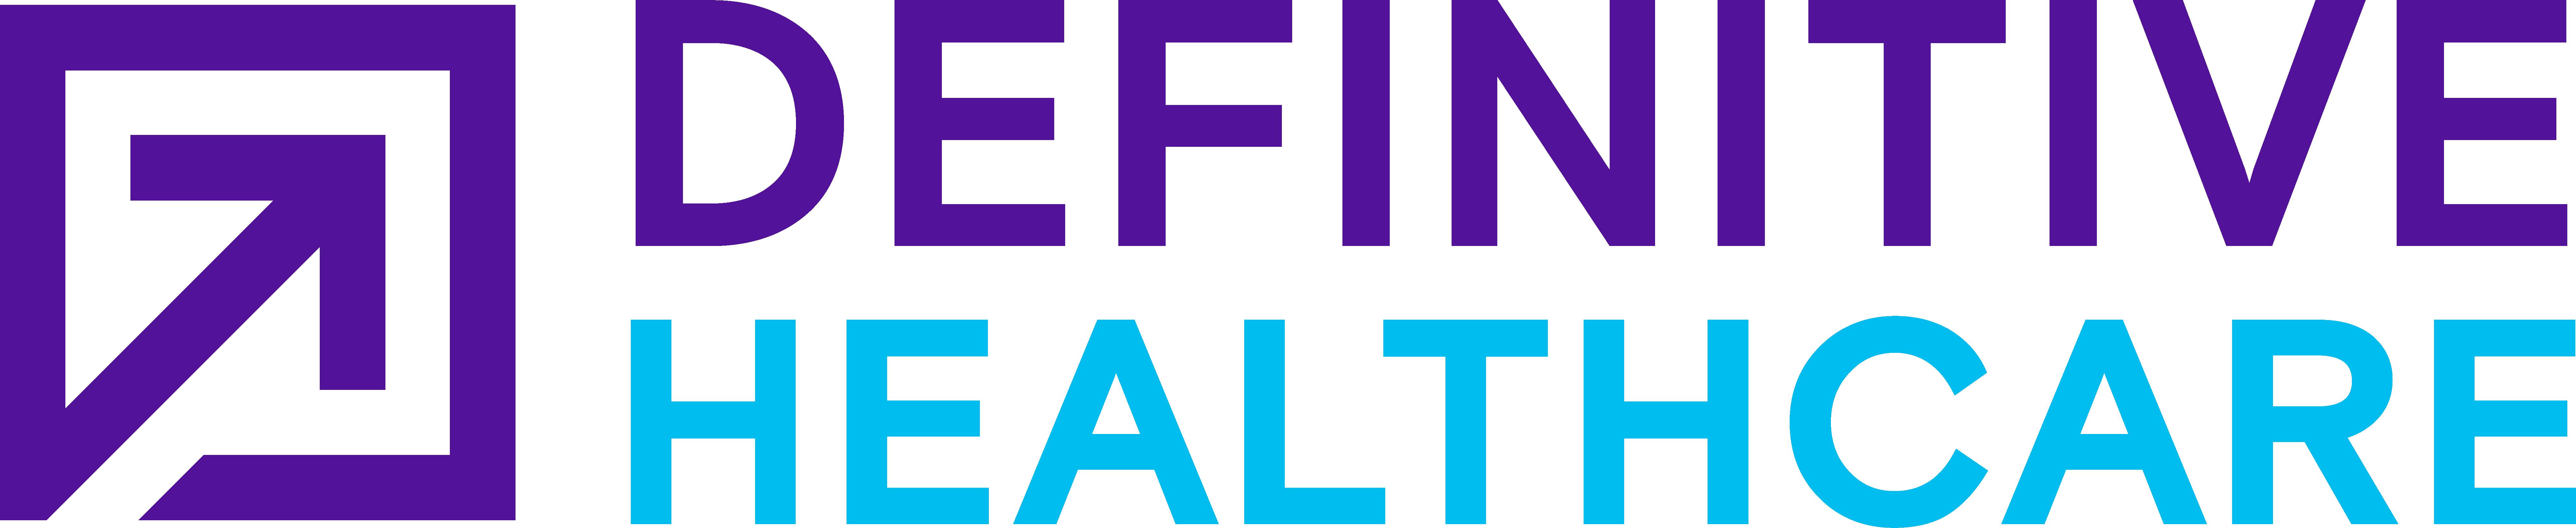 Definitive Healthcare, LLC logo